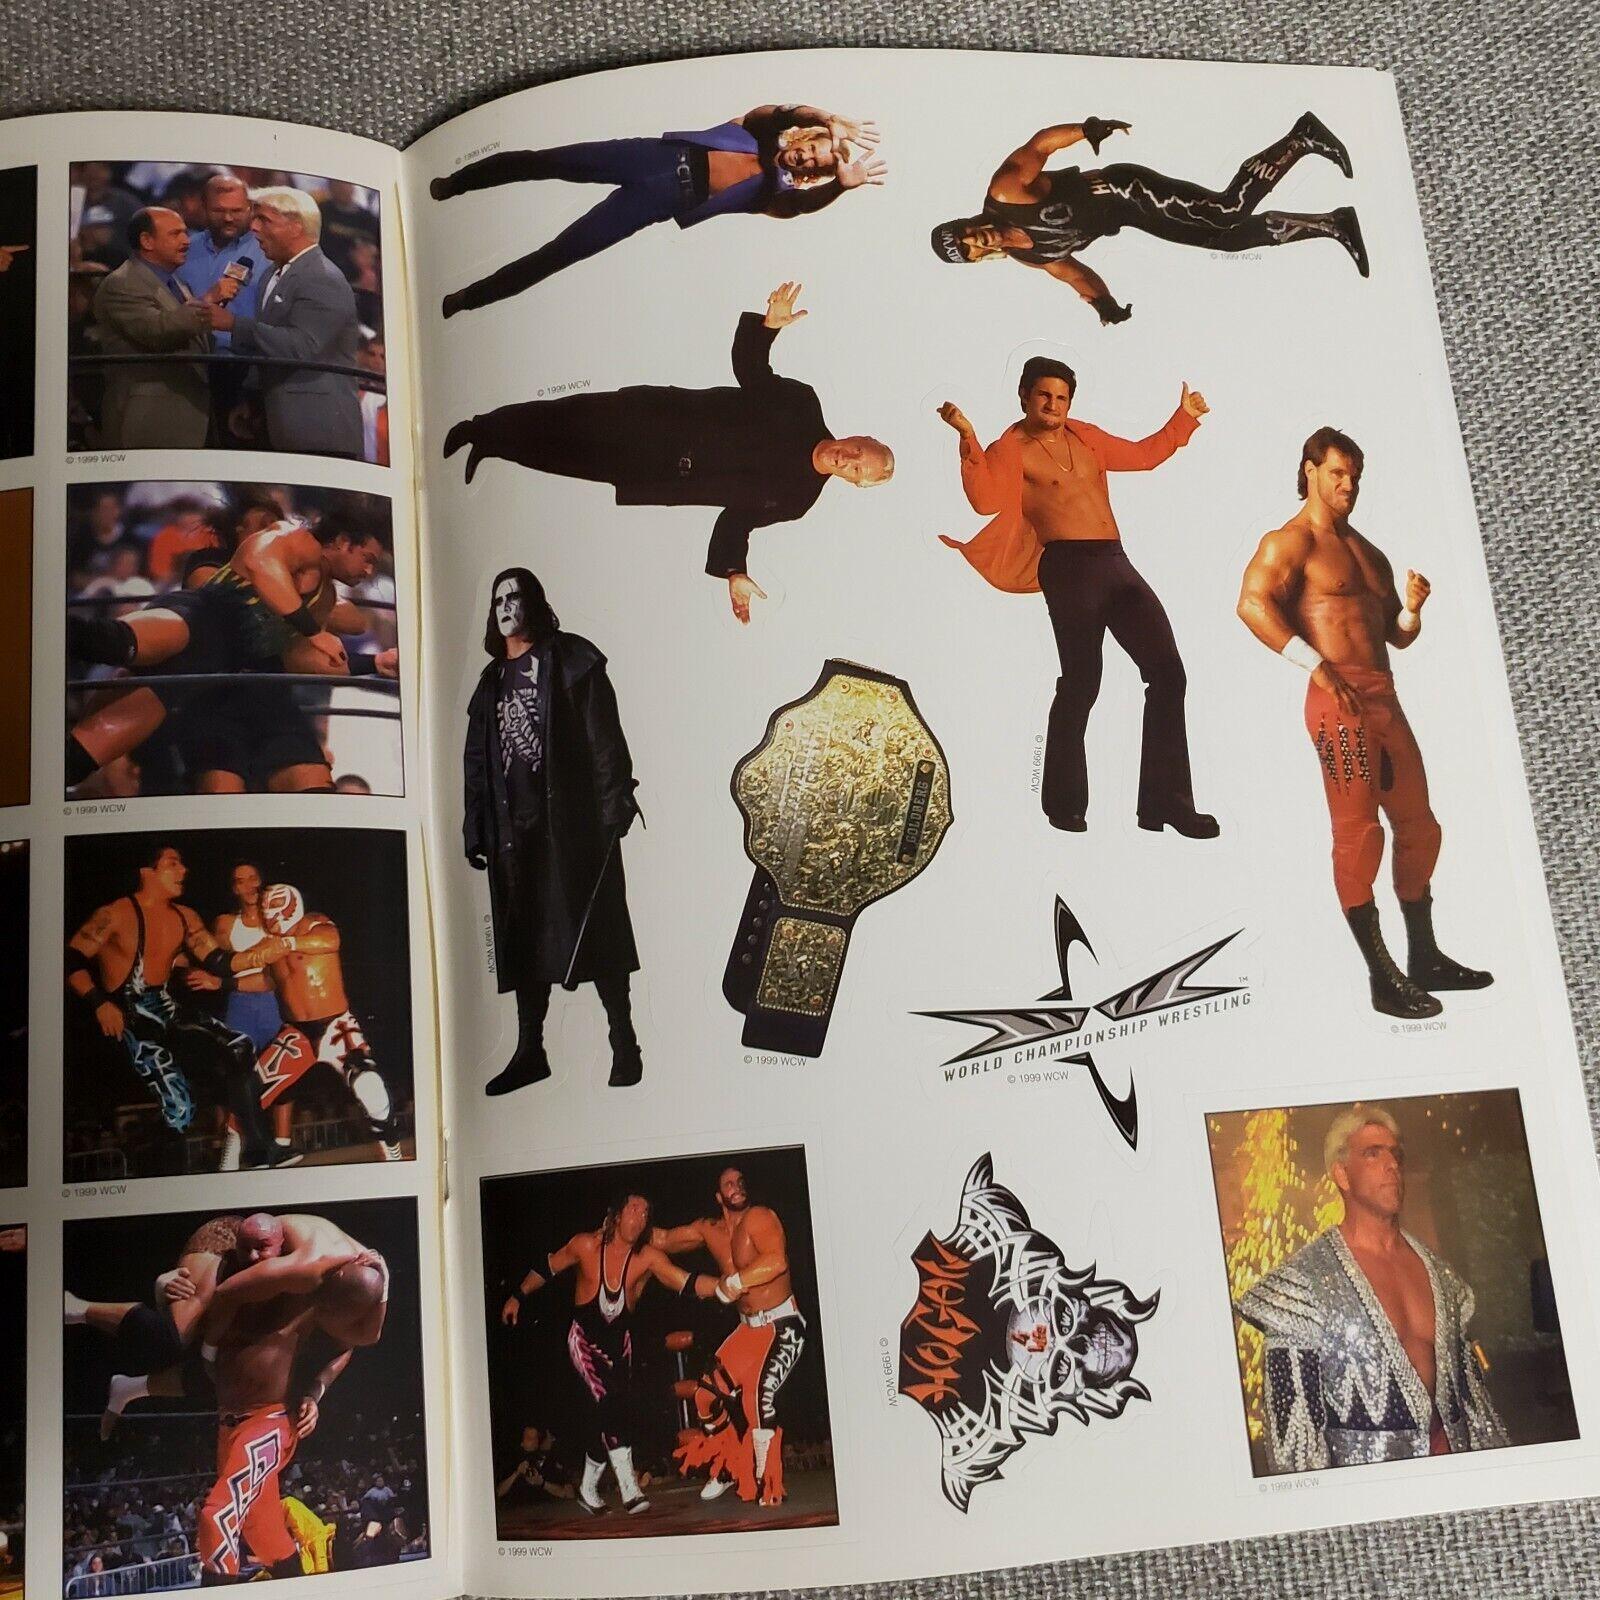 Wcw 1999 Slamboree Wrestling Sticker Album Coloring Book For Sale Online Ebay